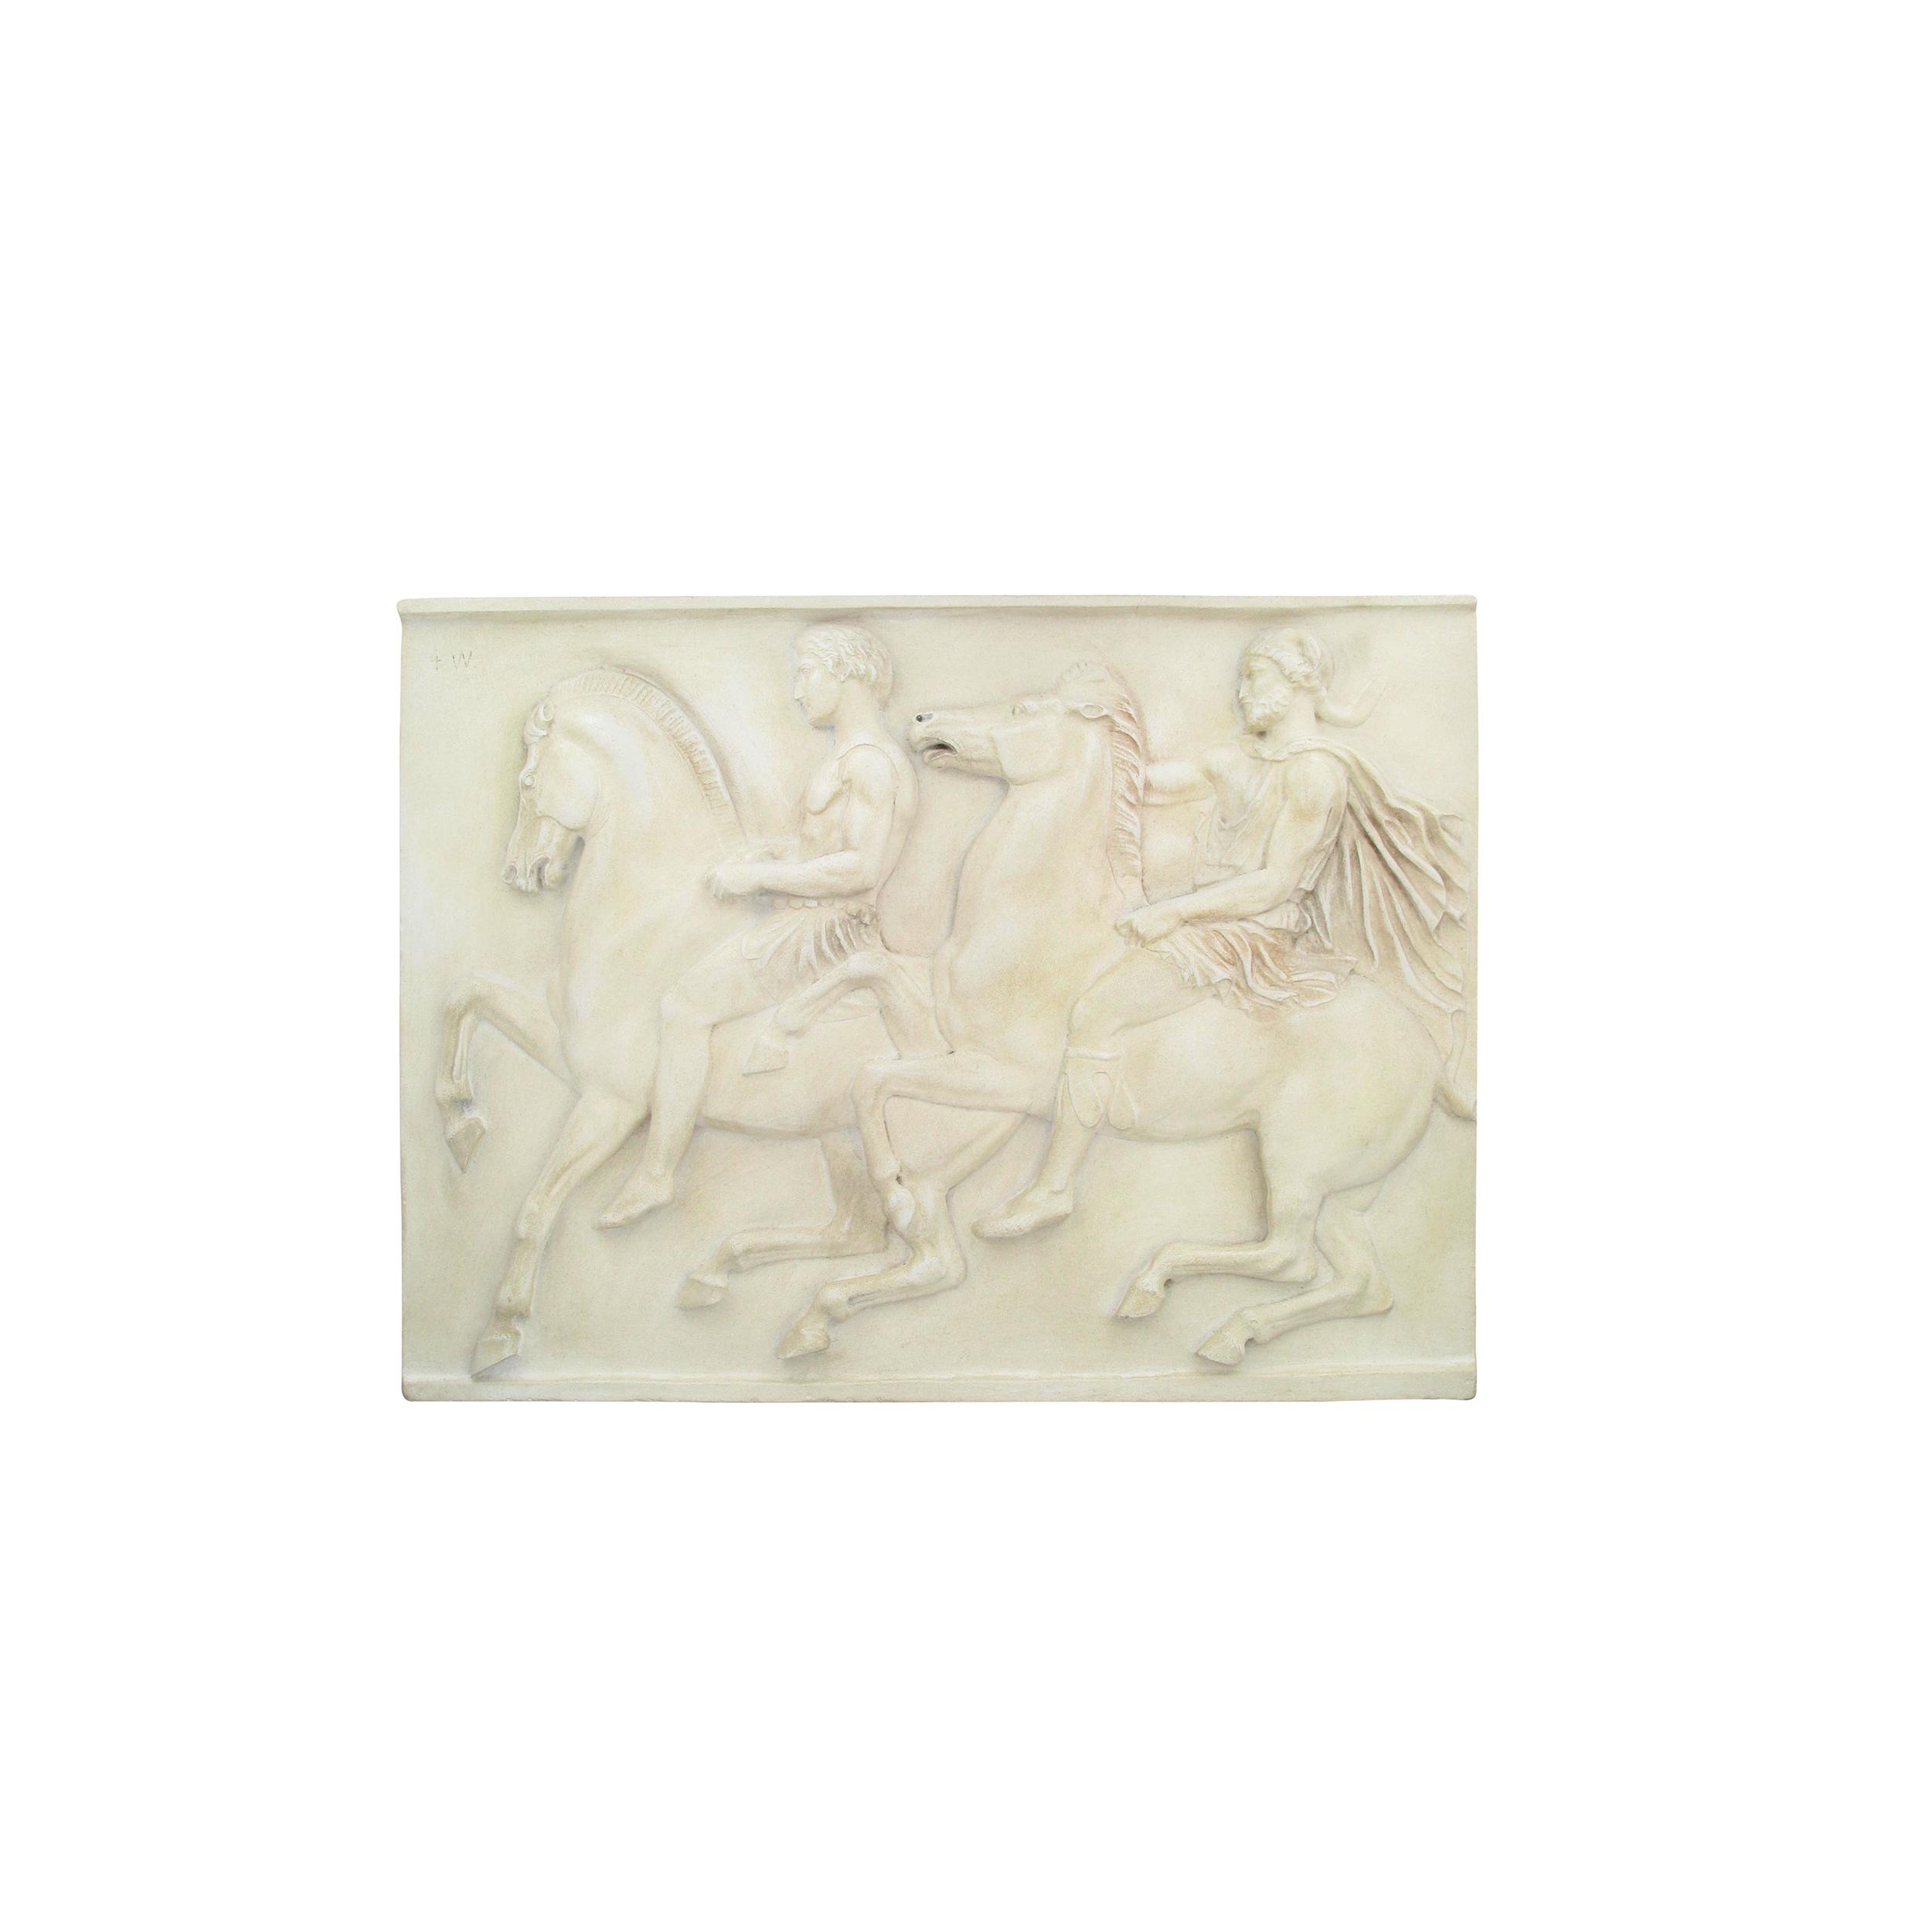 Parthenon sculpture plaque: Pair of horsemen